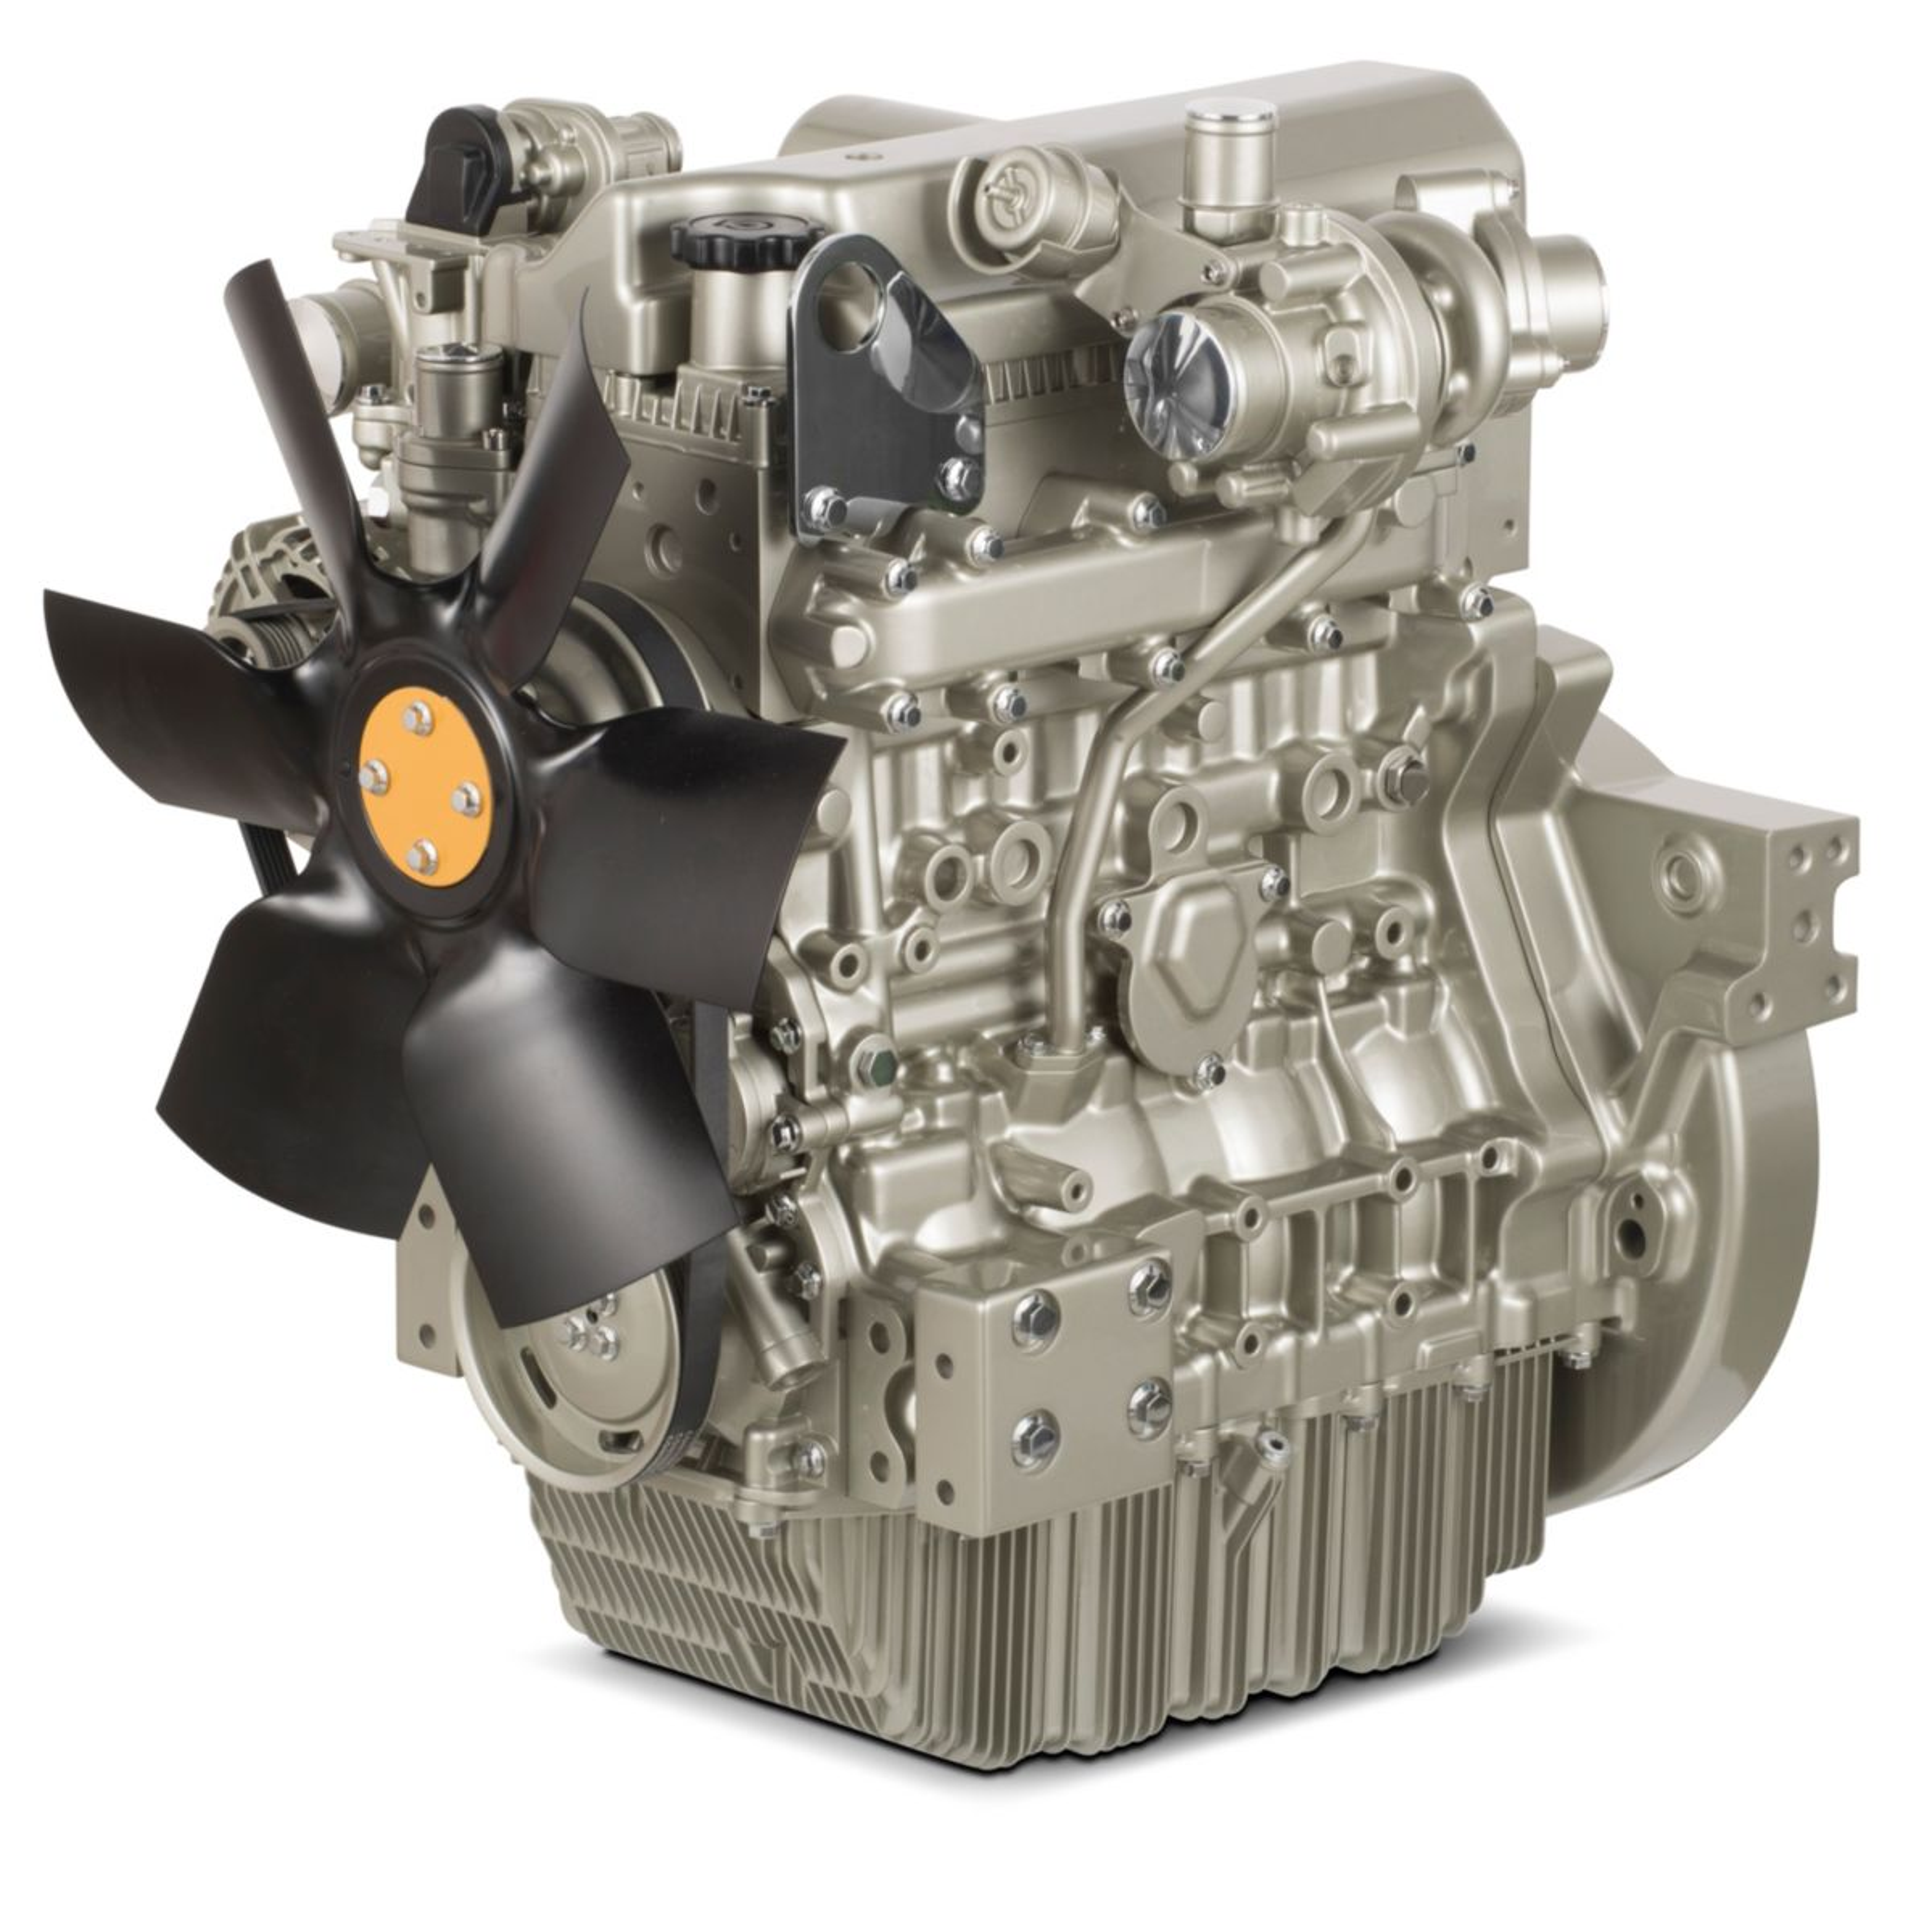 New Perkins® Syncro 2.8 litre engine unveiled at Bauma China